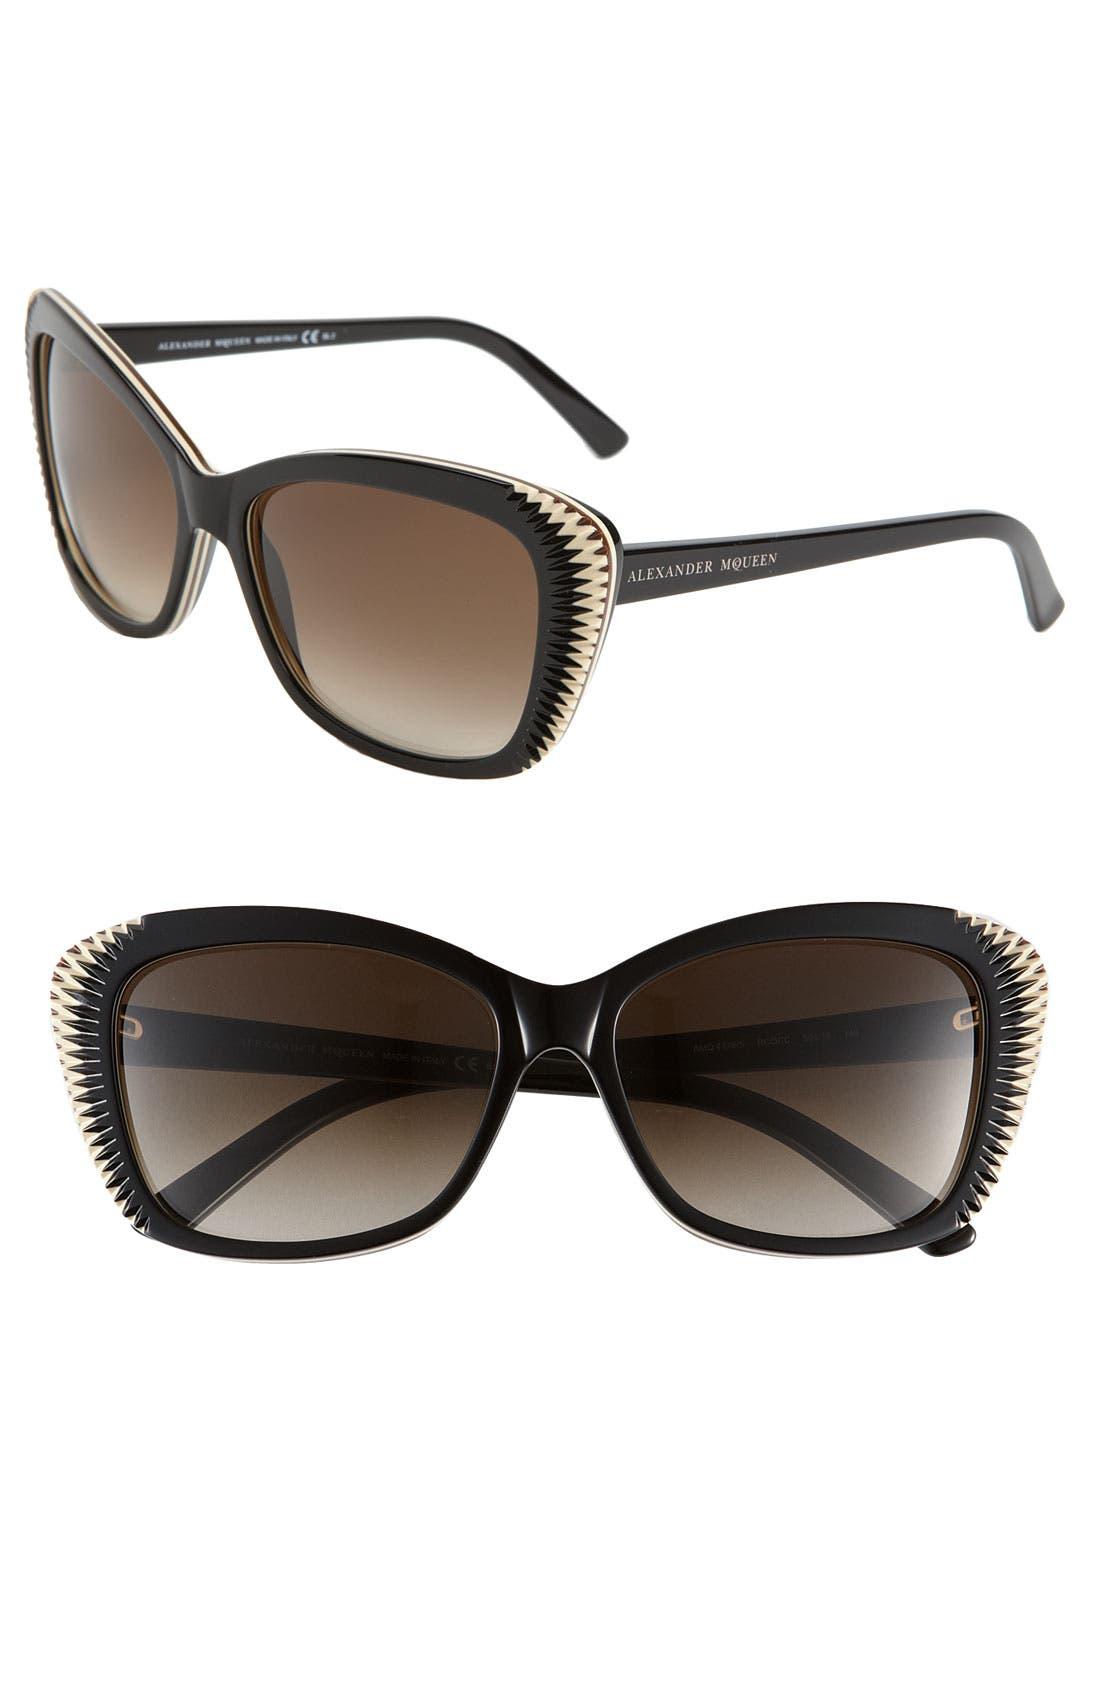 Main Image - Alexander McQueen Cat's Eye Sunglasses